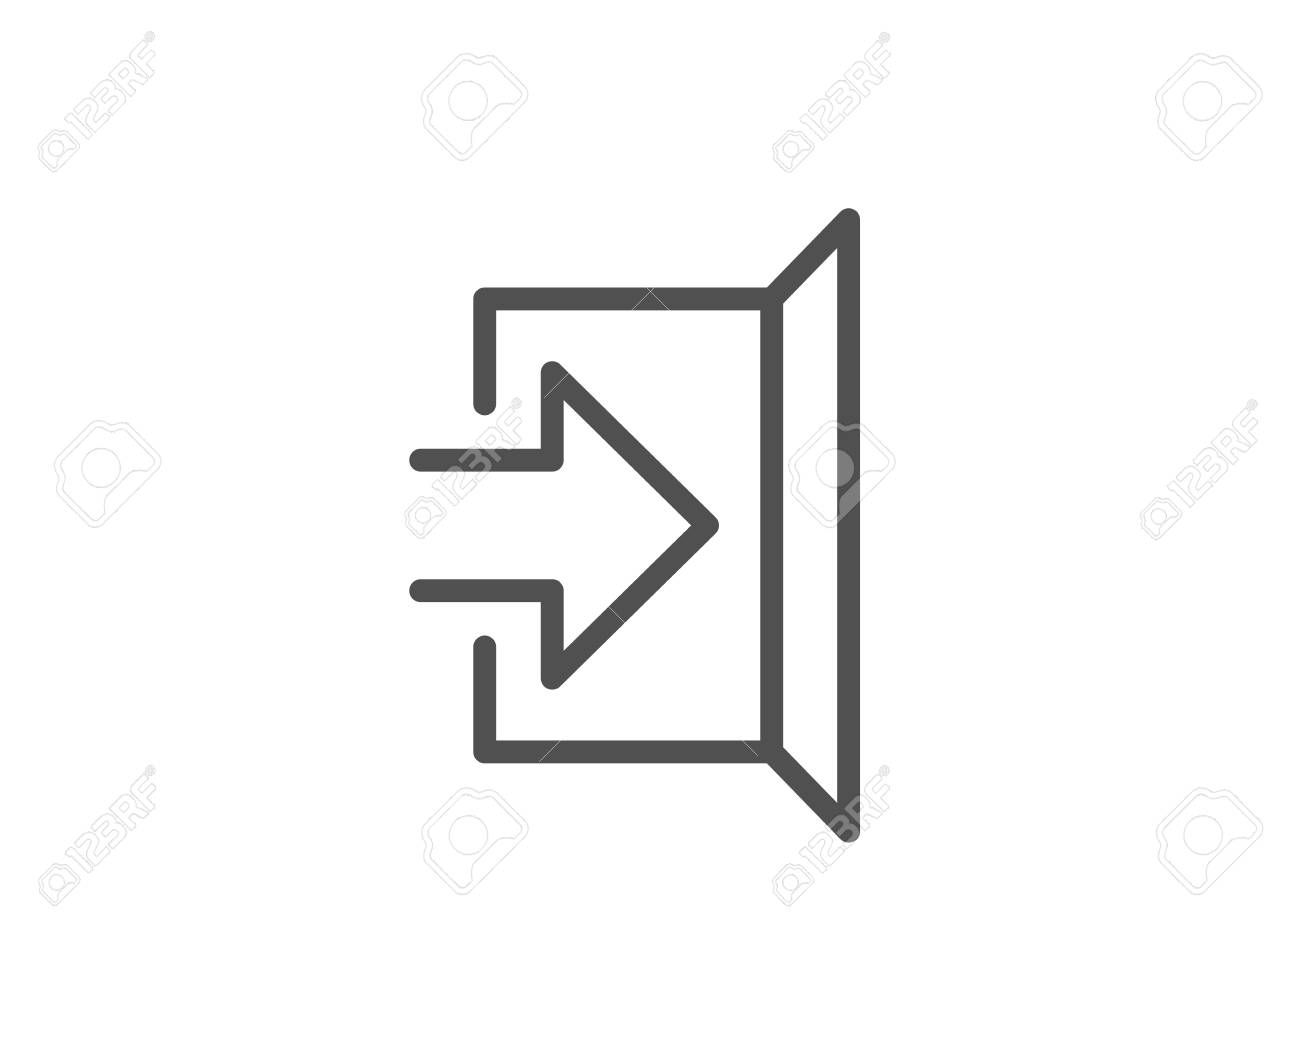 Exit line icon. Open door sign. Entrance symbol with arrow. Quality design element. Editable stroke Vector - 93832659